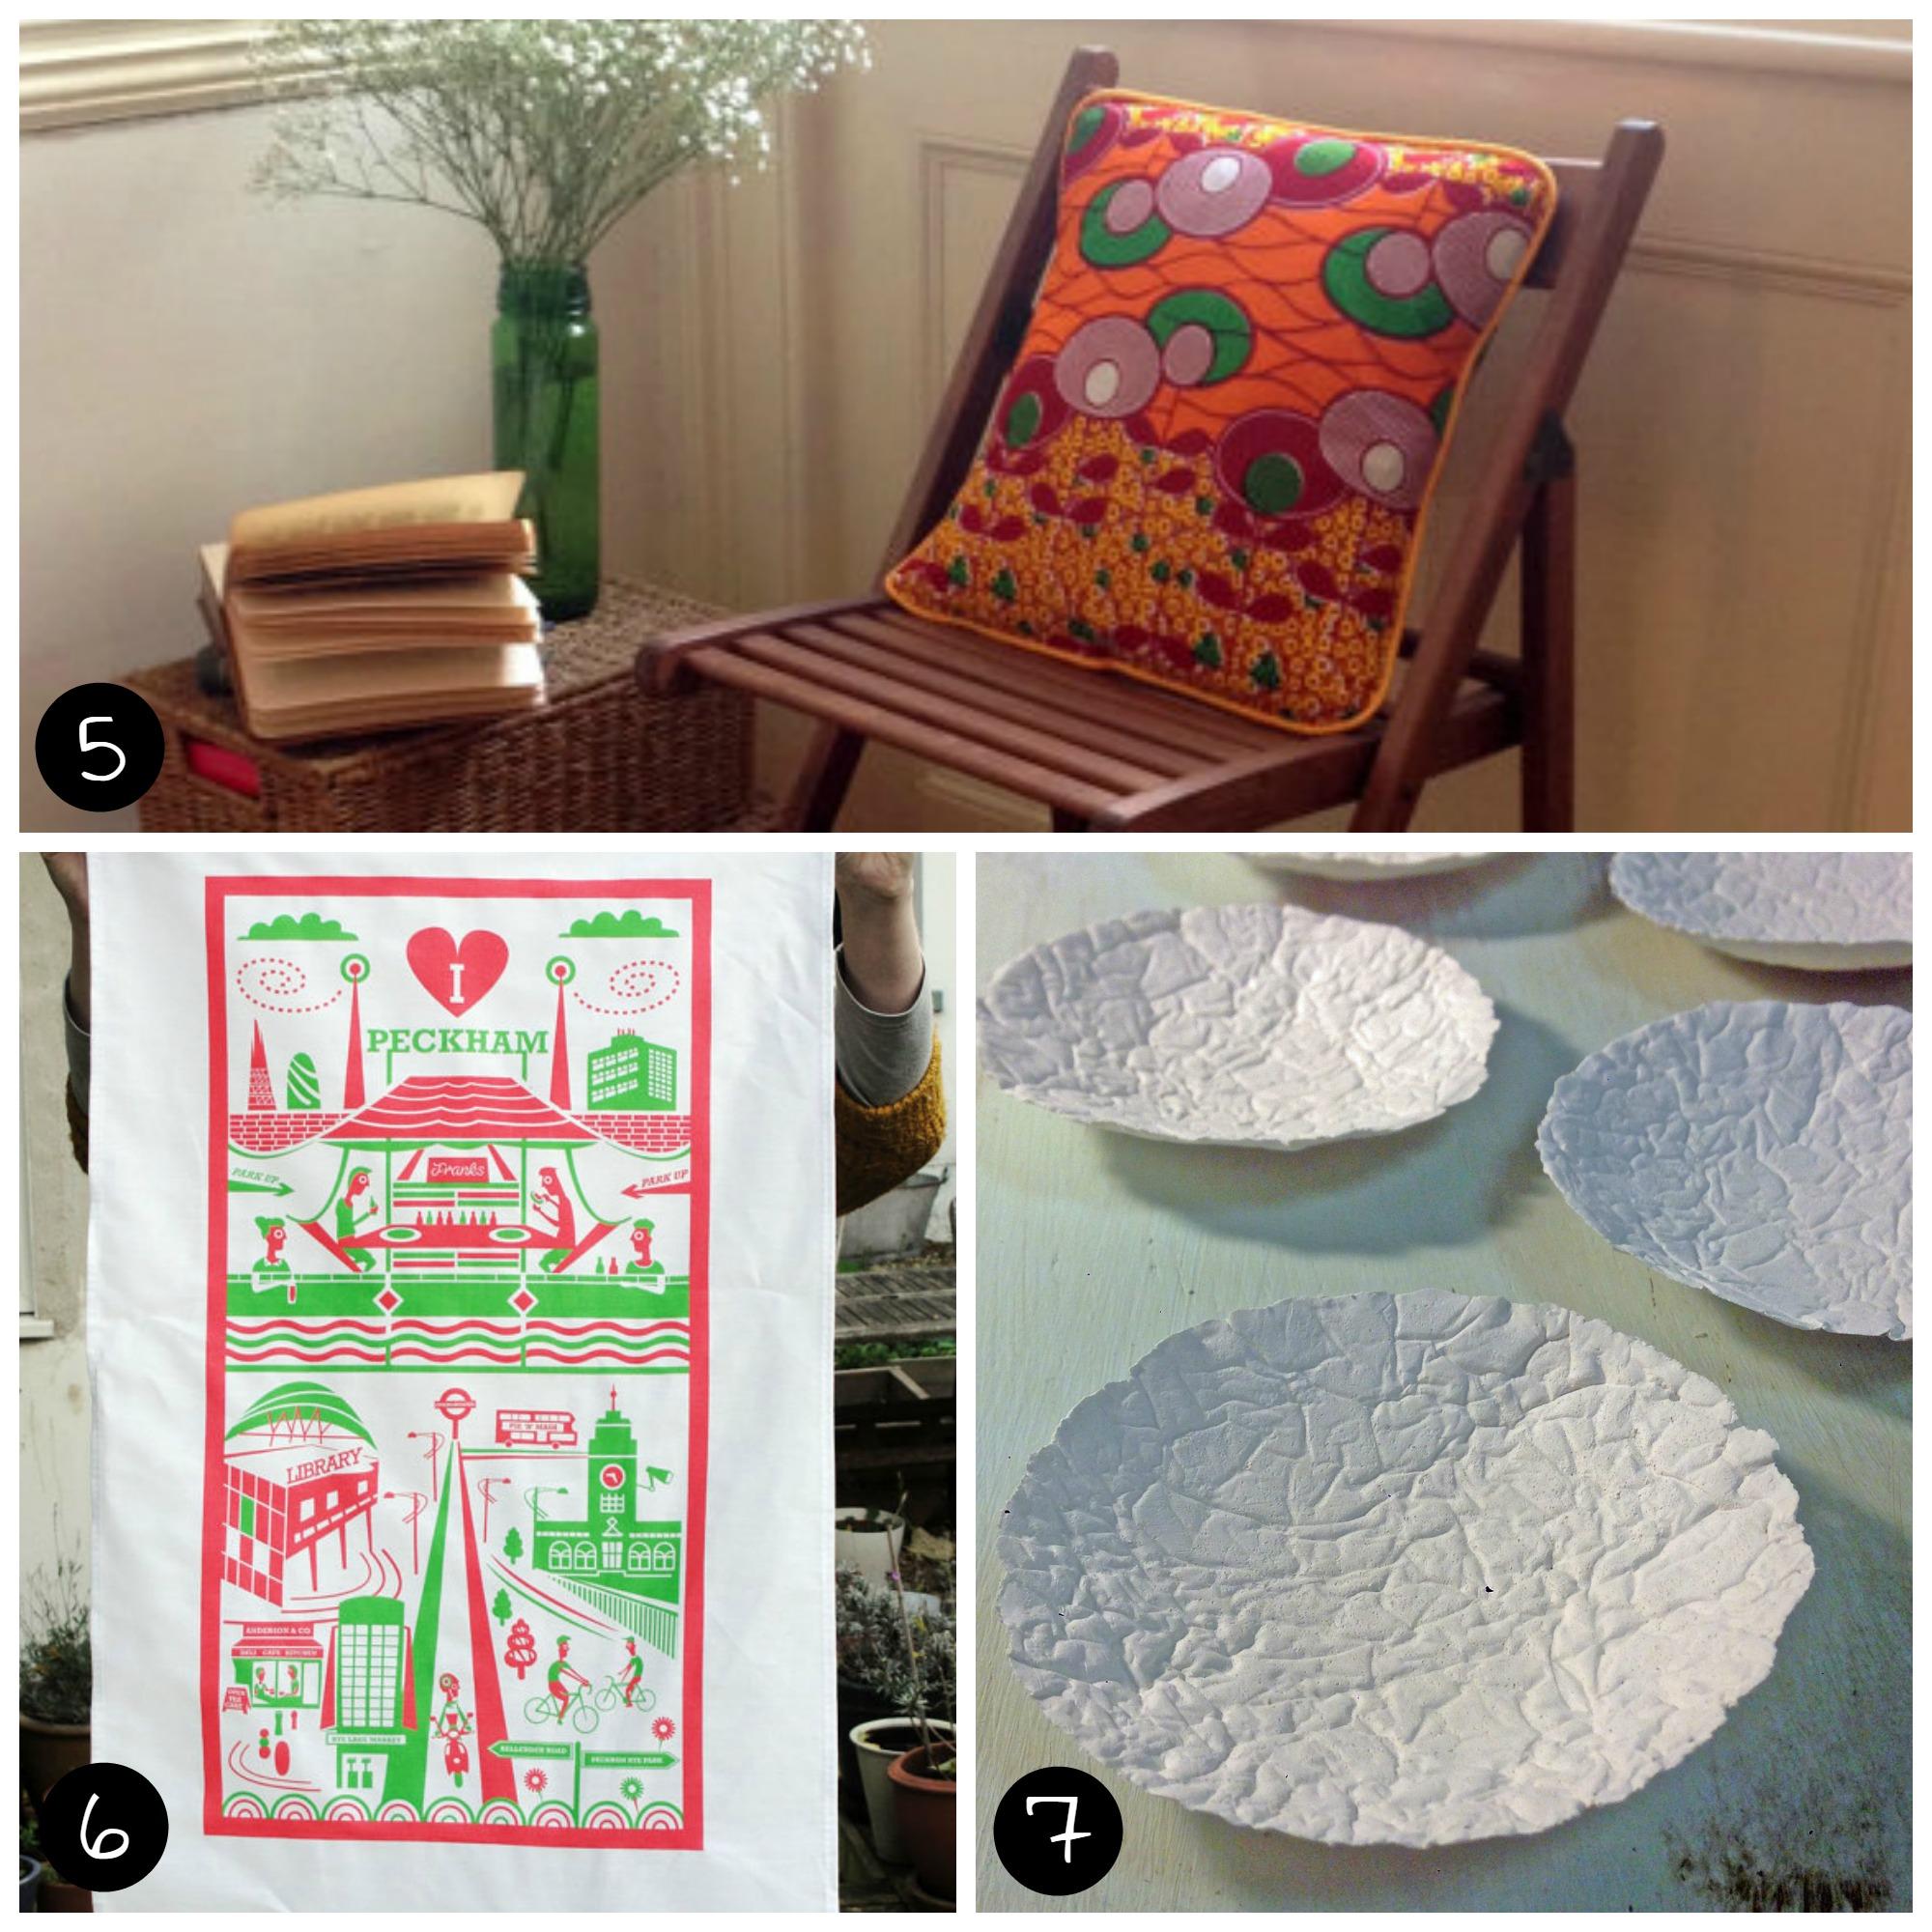 5. Gaynor Trophies  (Brixton - Sun 26 April), 6. Ray Stanbrook Prints  (Peckham - Sat 11 April), 7. White Light Ceramics  (Peckham - Sun 12 April)